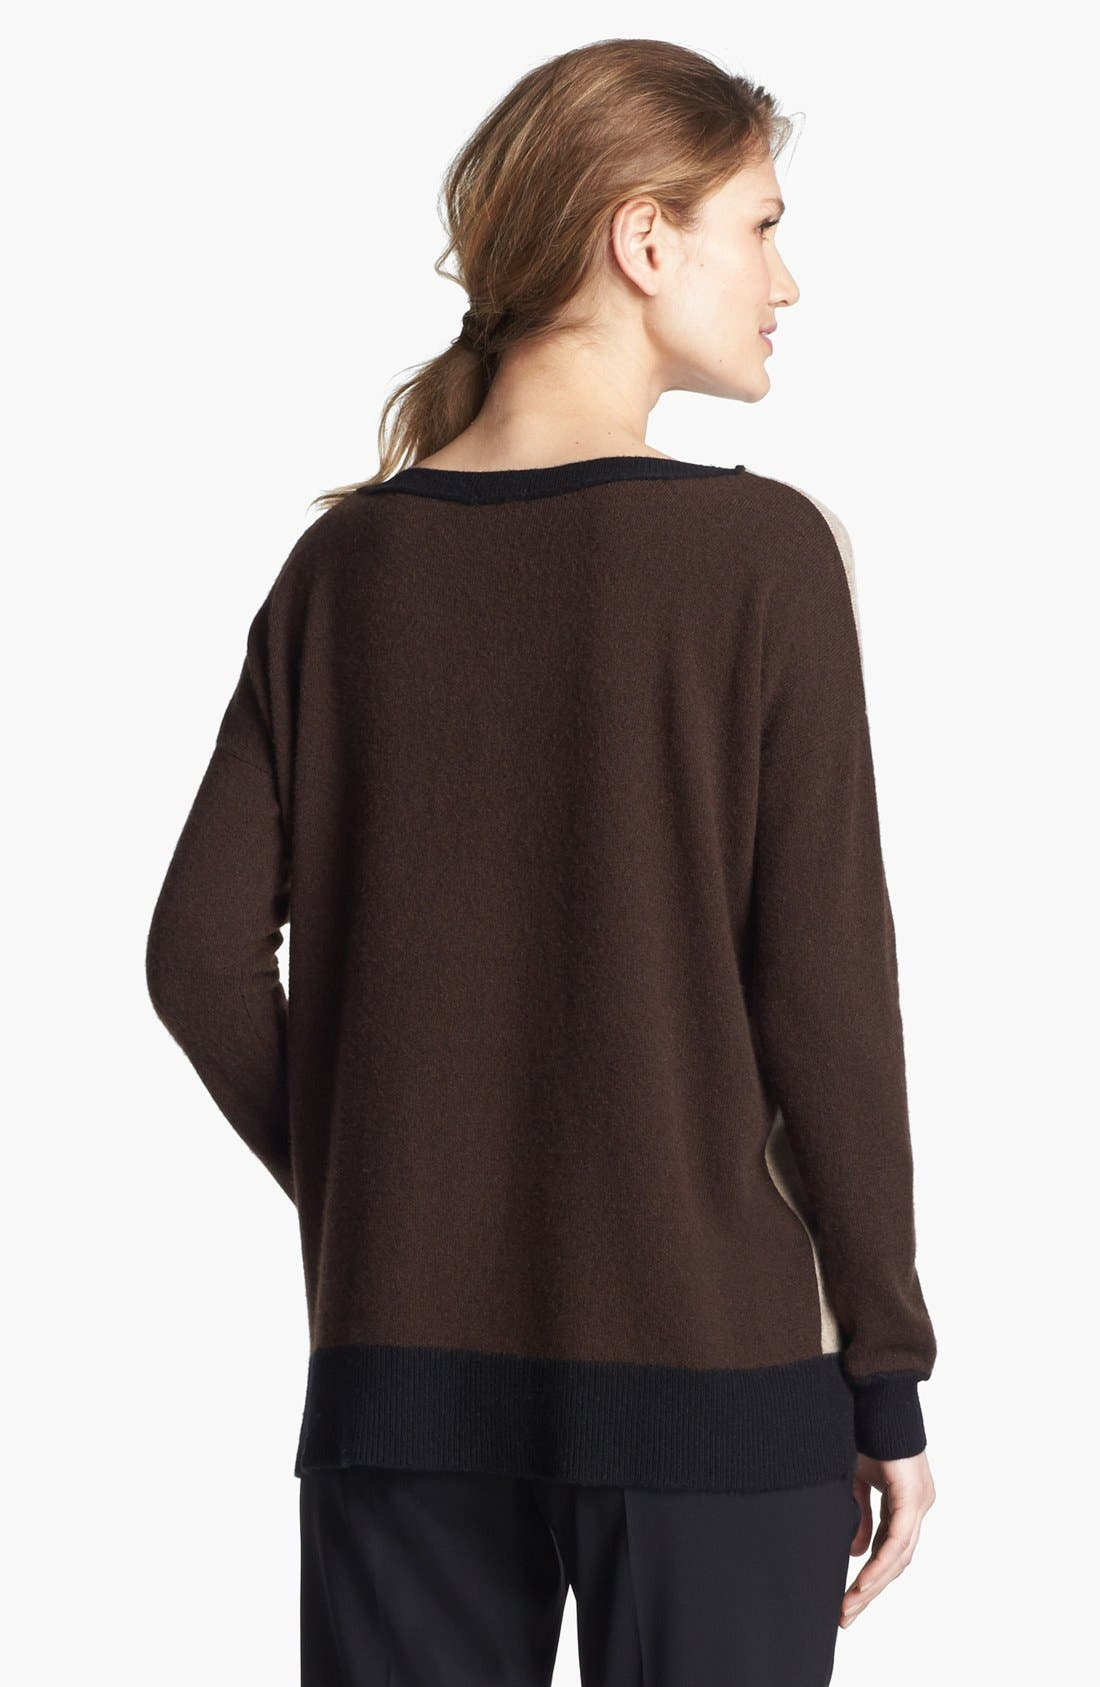 Colorblock Oversized Cashmere Sweater,                             Alternate thumbnail 2, color,                             Sand Multi